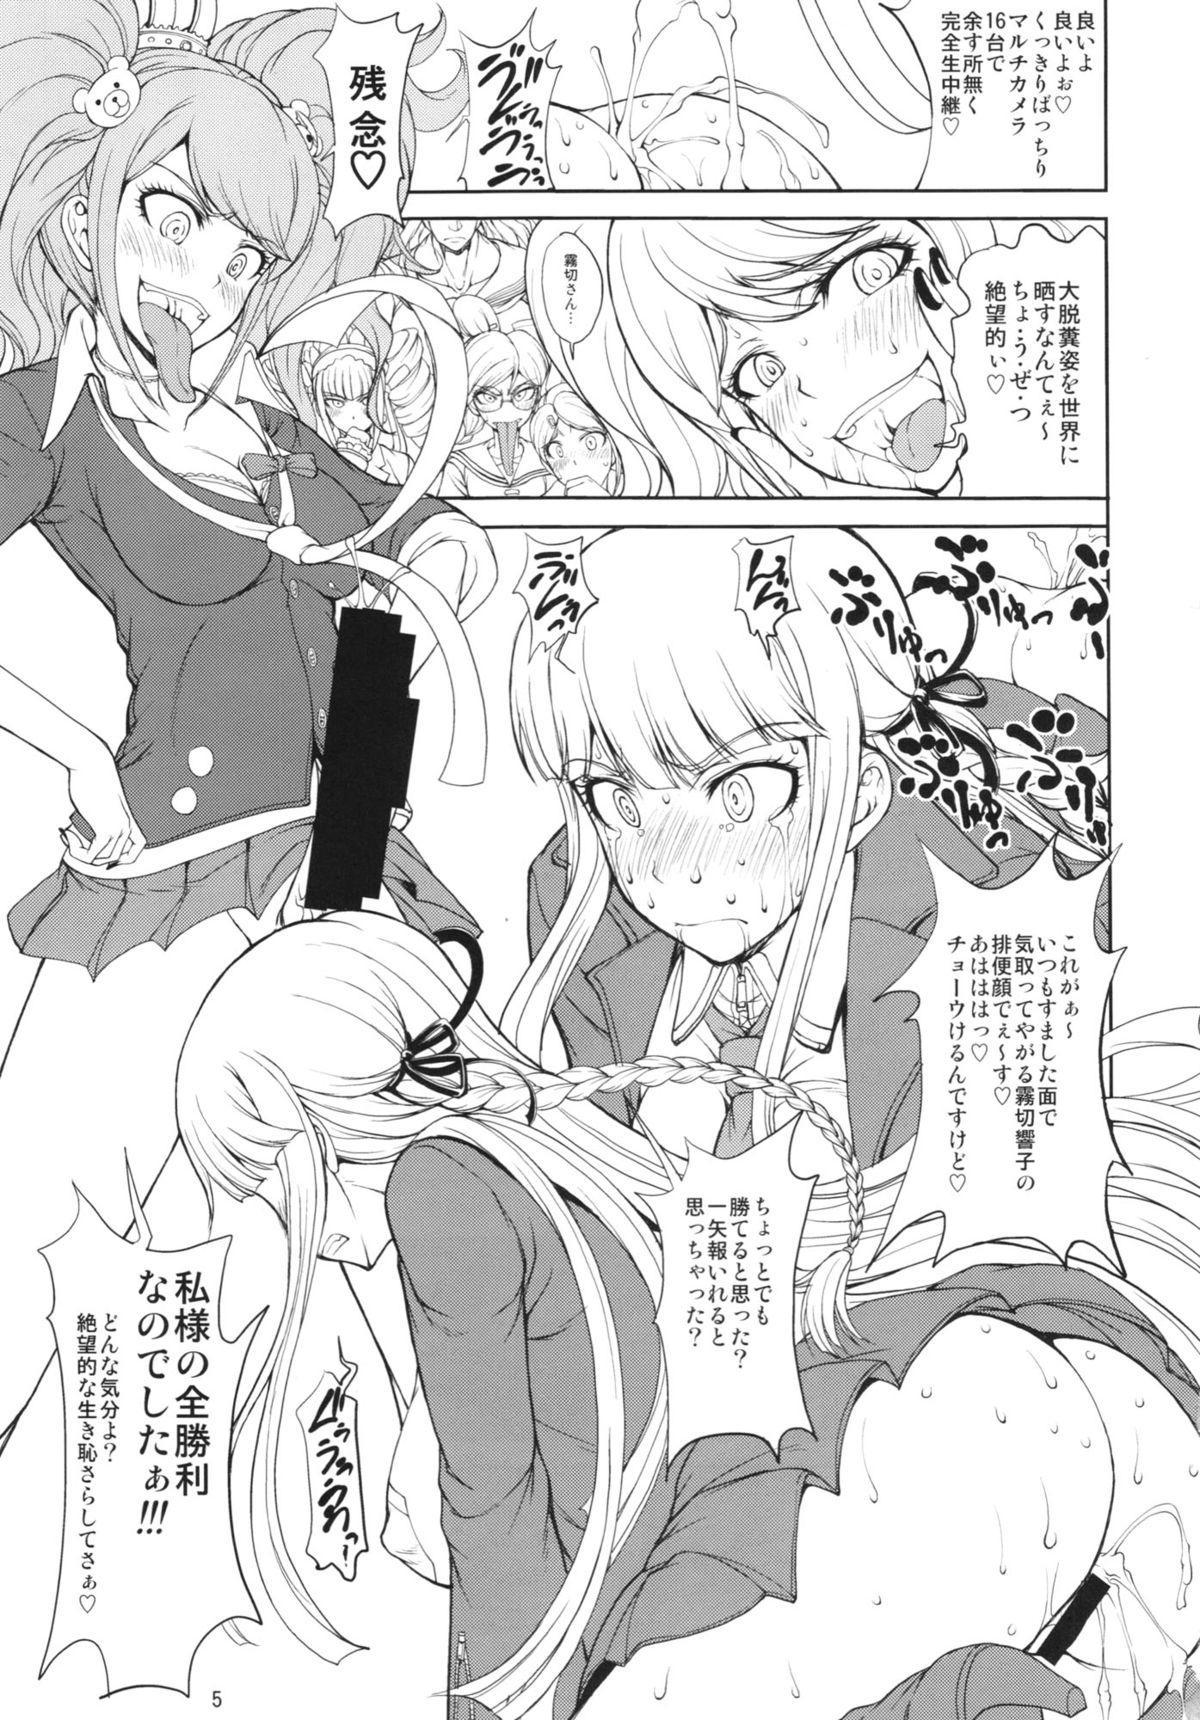 (C85) [Majimadou (Matou)] Enoshima-sensei no Chou Zetsubou-teki Zecchou Jugyou + Futaket Paper (Danganronpa) 4